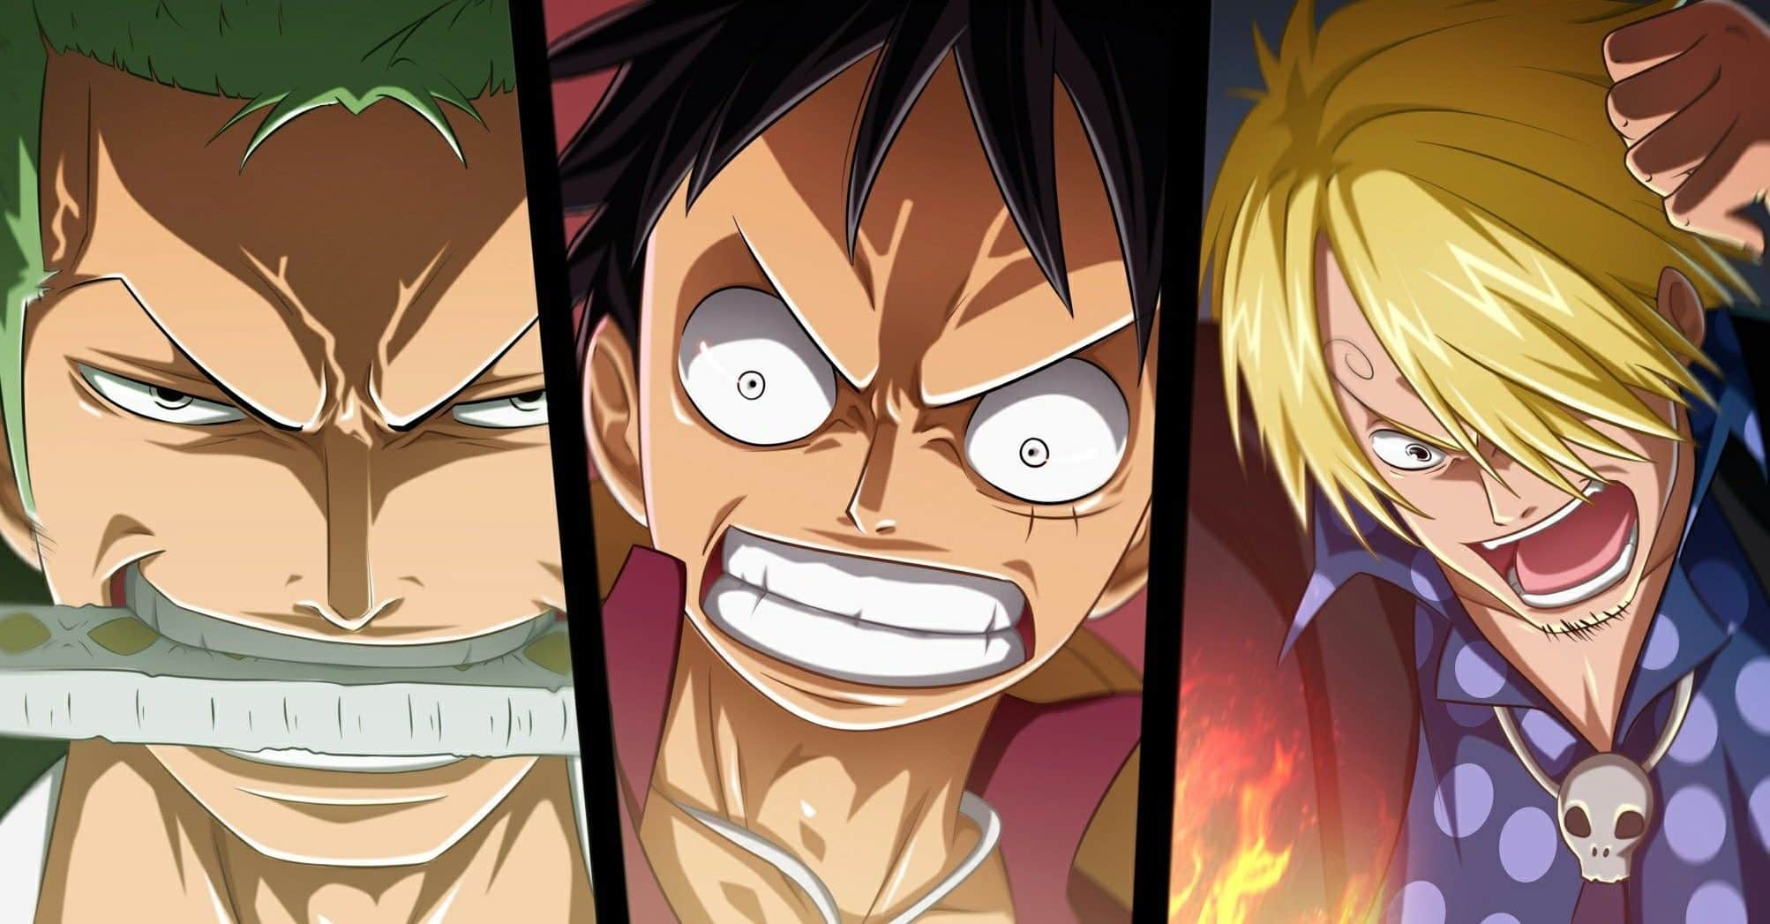 Report de la date de sortie du chapitre 1008 de One Piece : Eiichiro Oda fait une pause manga la semaine prochaine 3